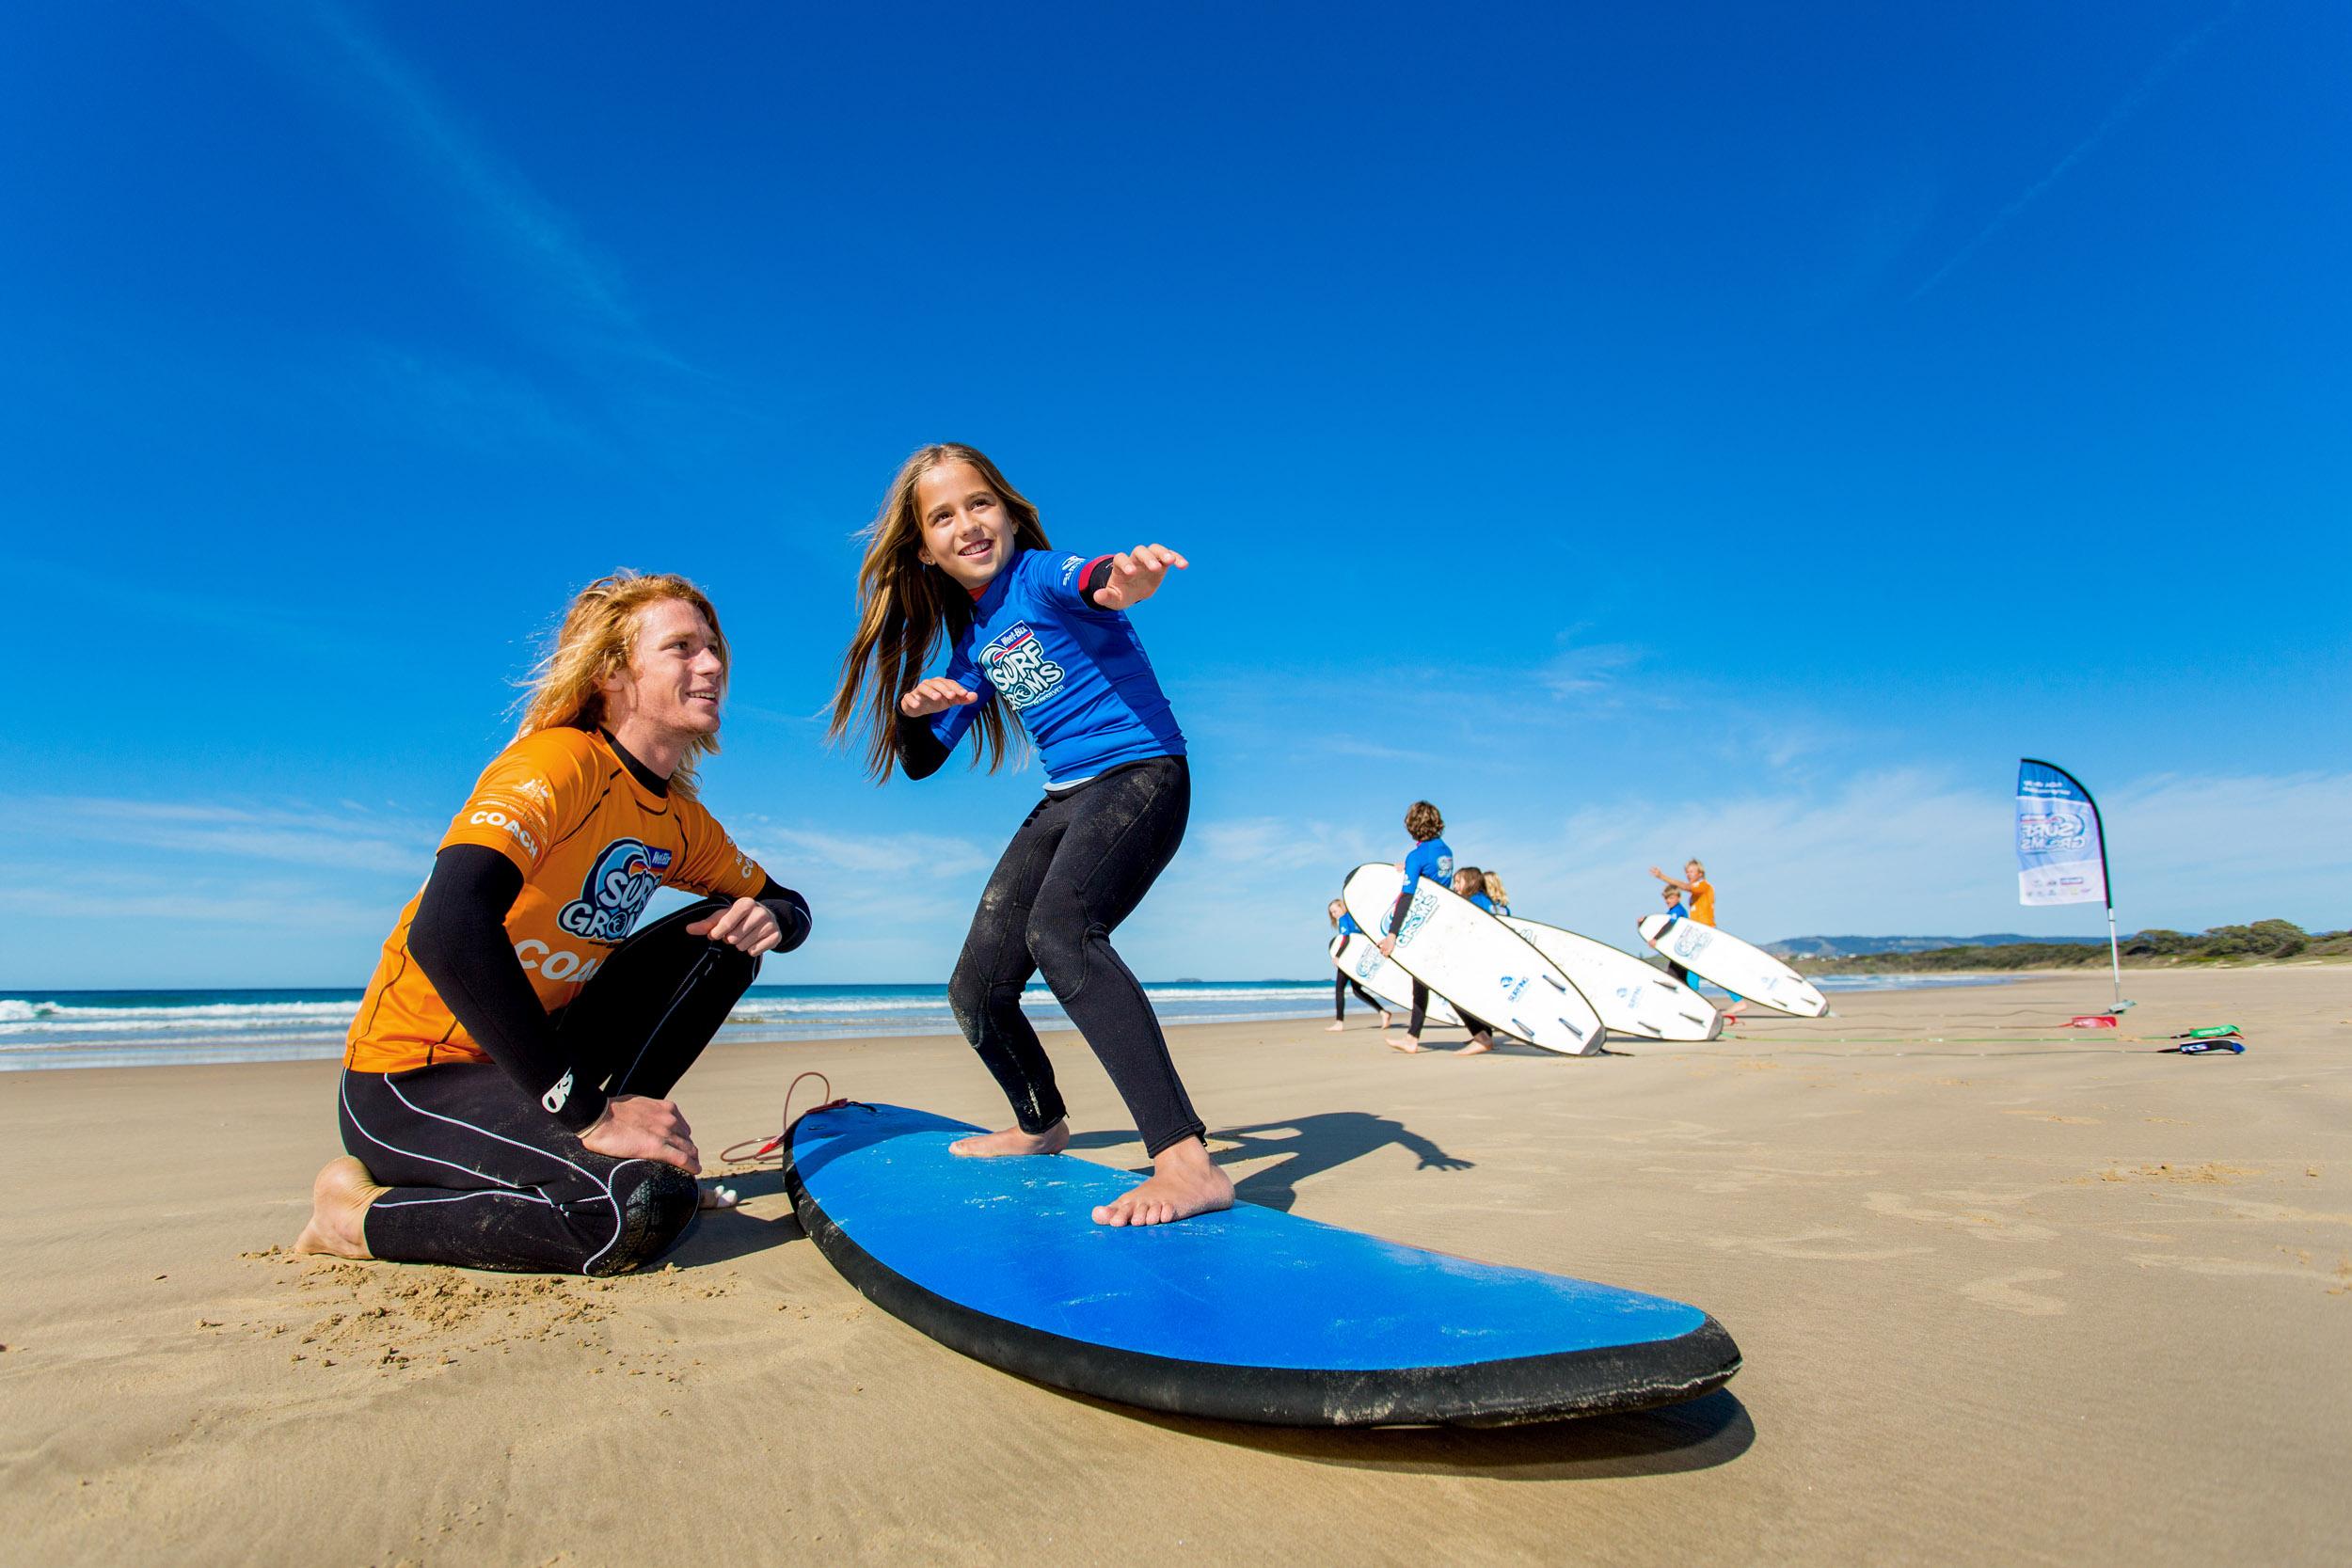 surfing-australia-surf-groms-photography-advertising.jpg